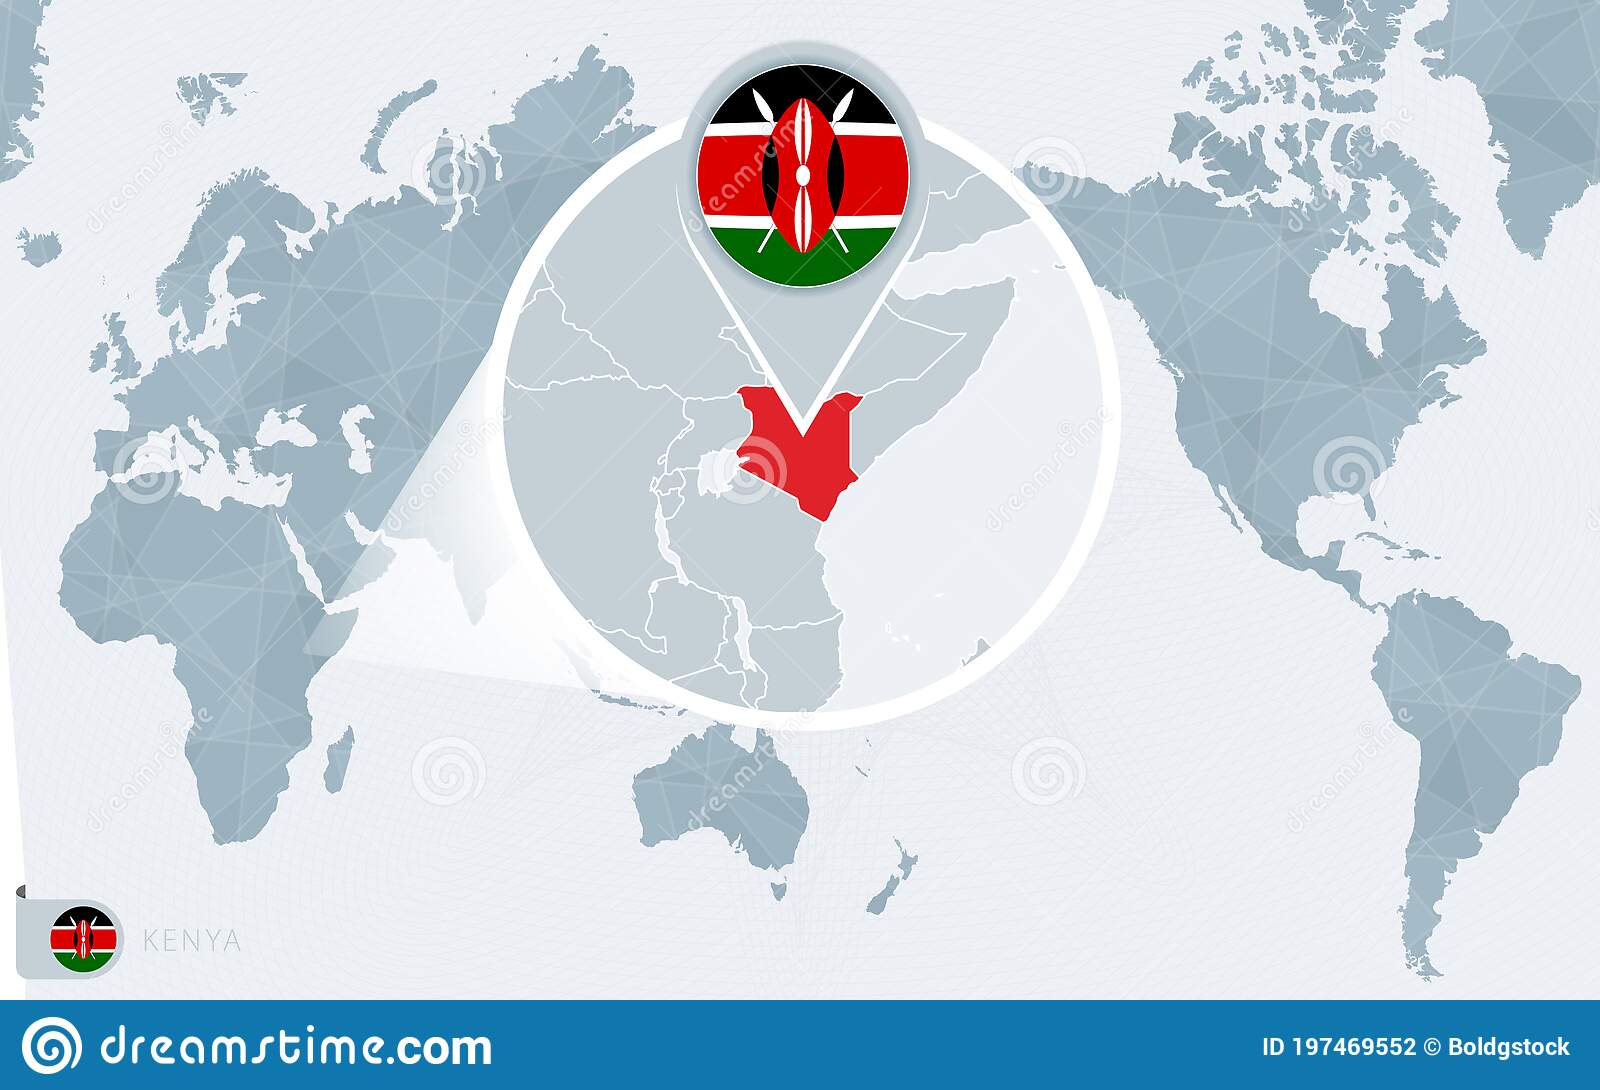 Image of: Kenya Map World Flag Pointer Stock Illustrations 22 Kenya Map World Flag Pointer Stock Illustrations Vectors Clipart Dreamstime